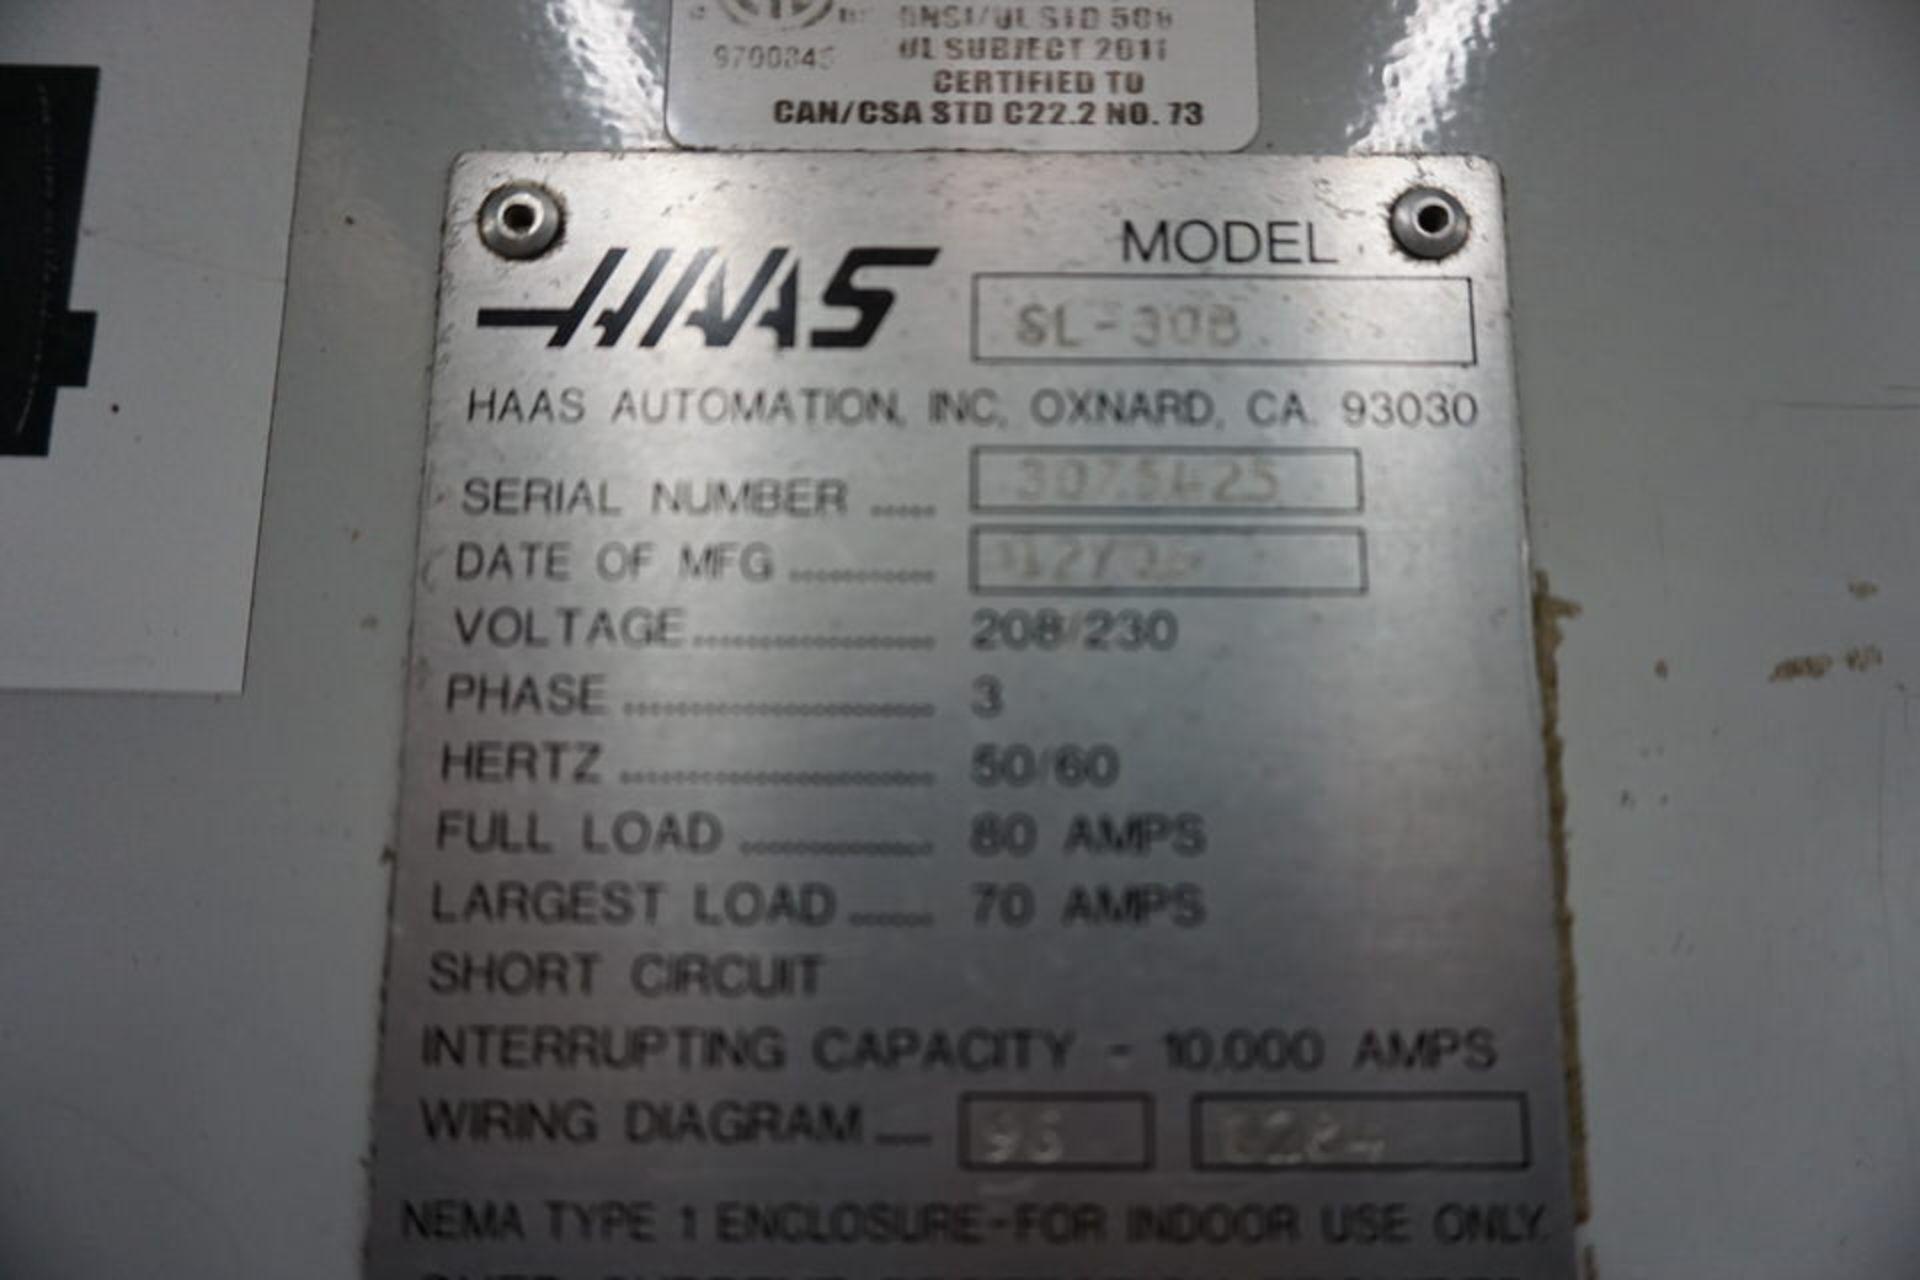 HAAS DOUBLE CHUCK SL-30B CNC LATHE W/ (2) 3 JAW CHUCK, 12 STATION TURRET & HAAS CNC CTRL - Image 6 of 6